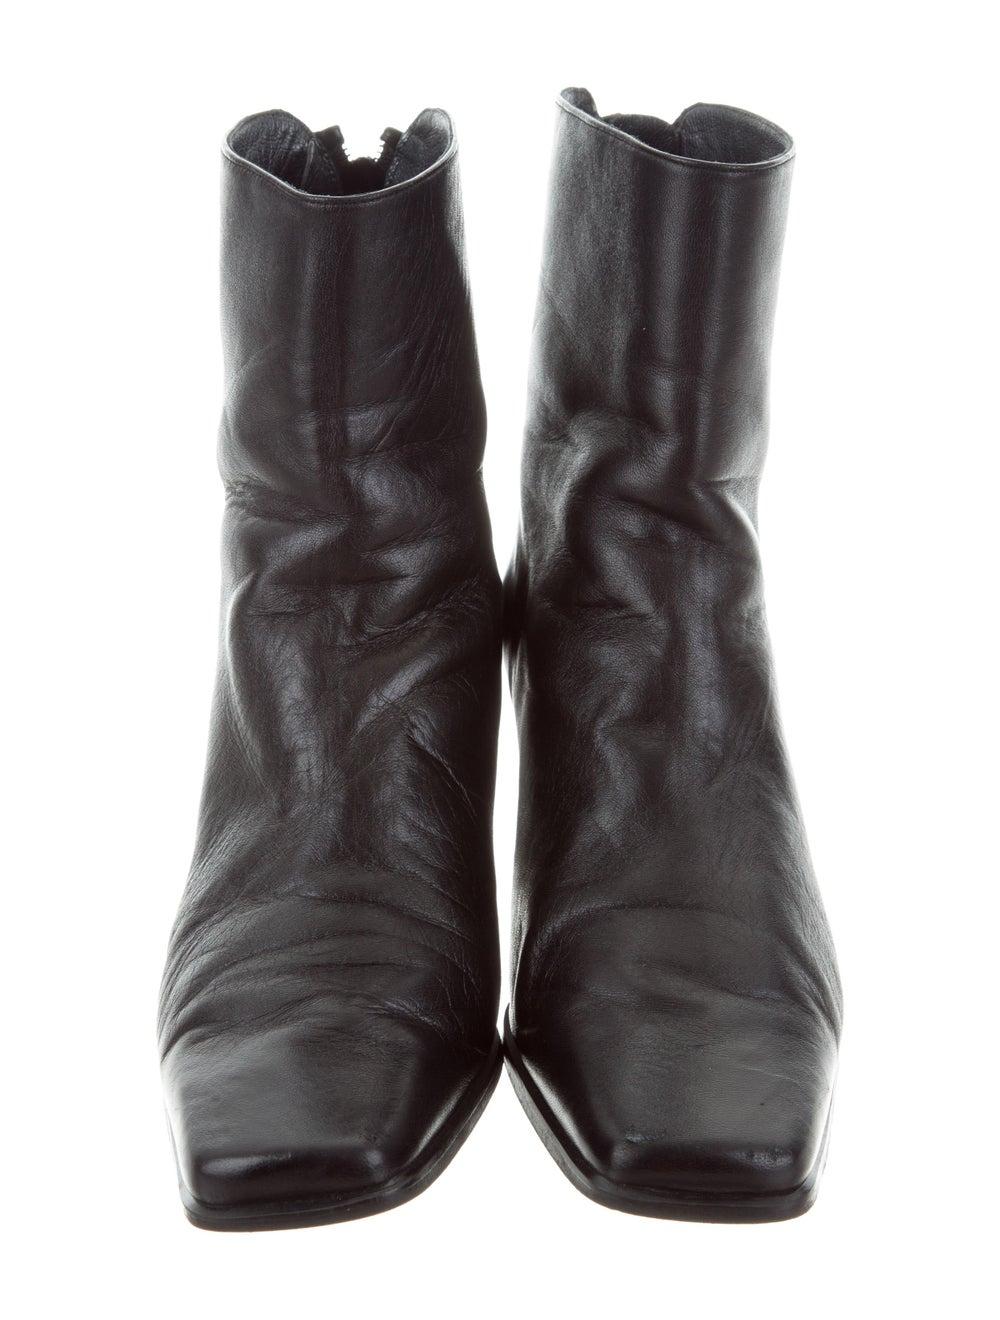 Stuart Weitzman Leather Square-Toe Ankle Boots Bl… - image 3